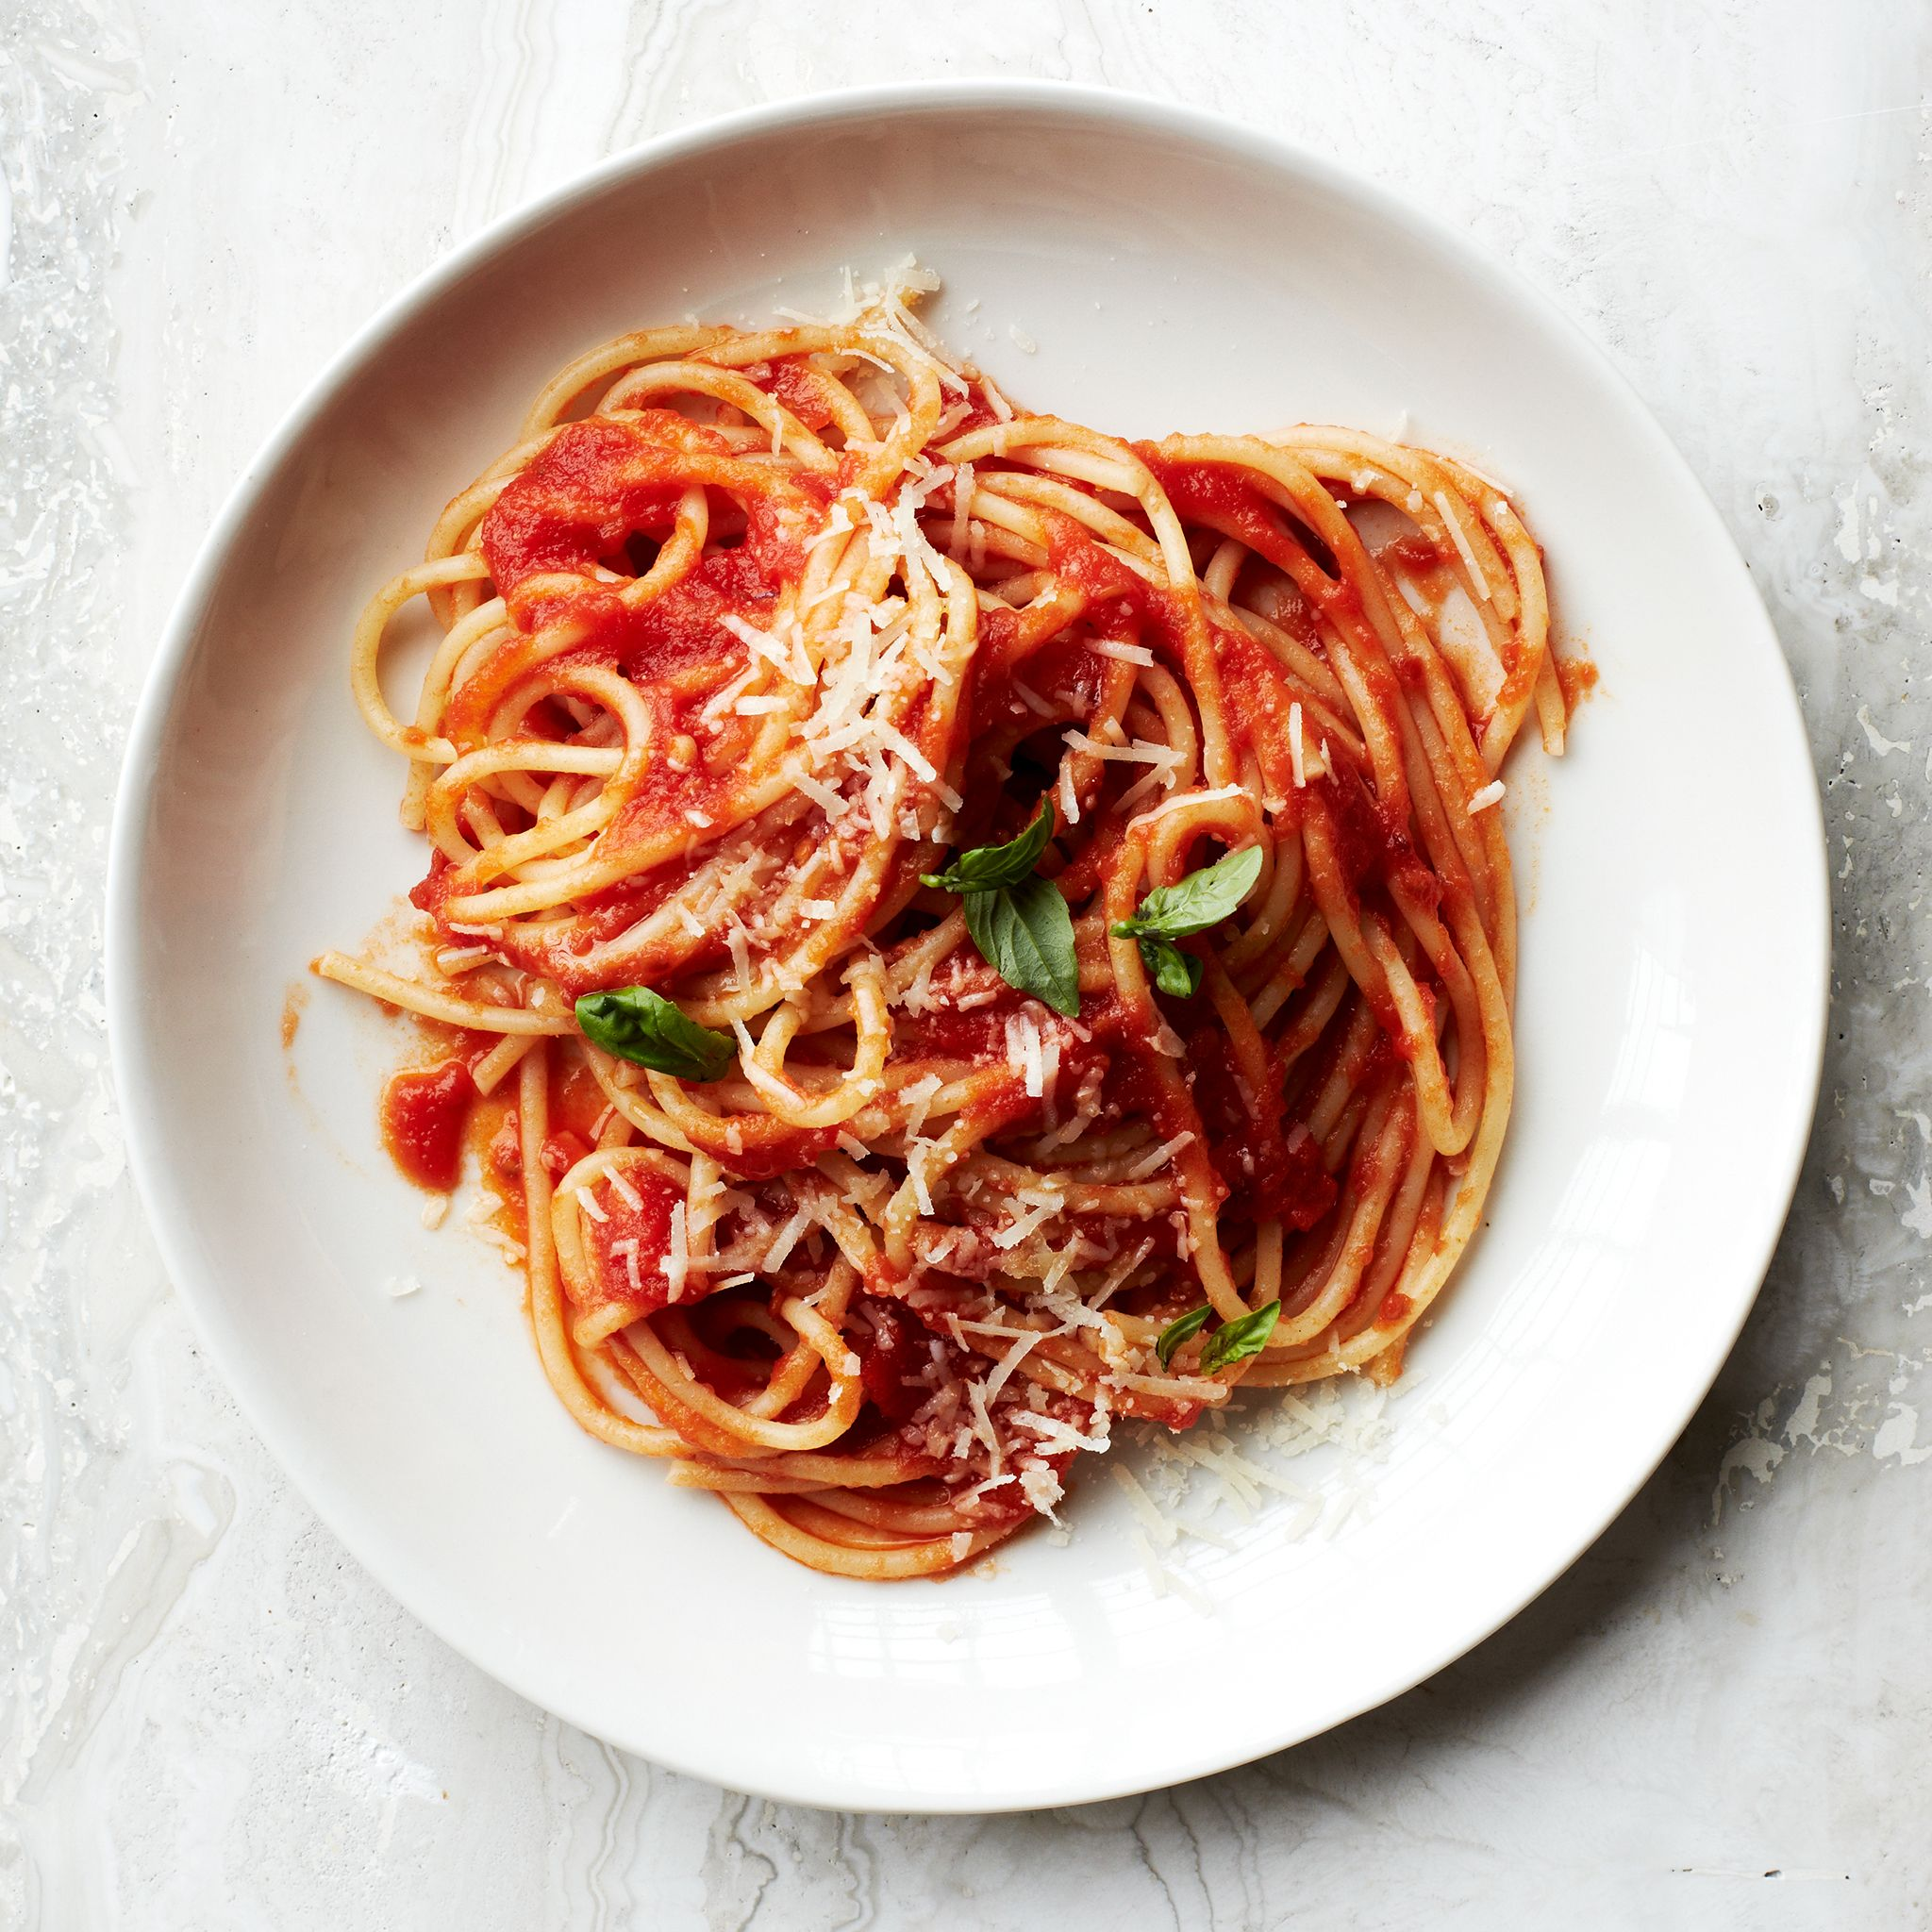 Sauce Simmered Spaghetti Al Pomodoro Spaghetti Al Pomodoro Healthy Pastas Pomodoro Recipe